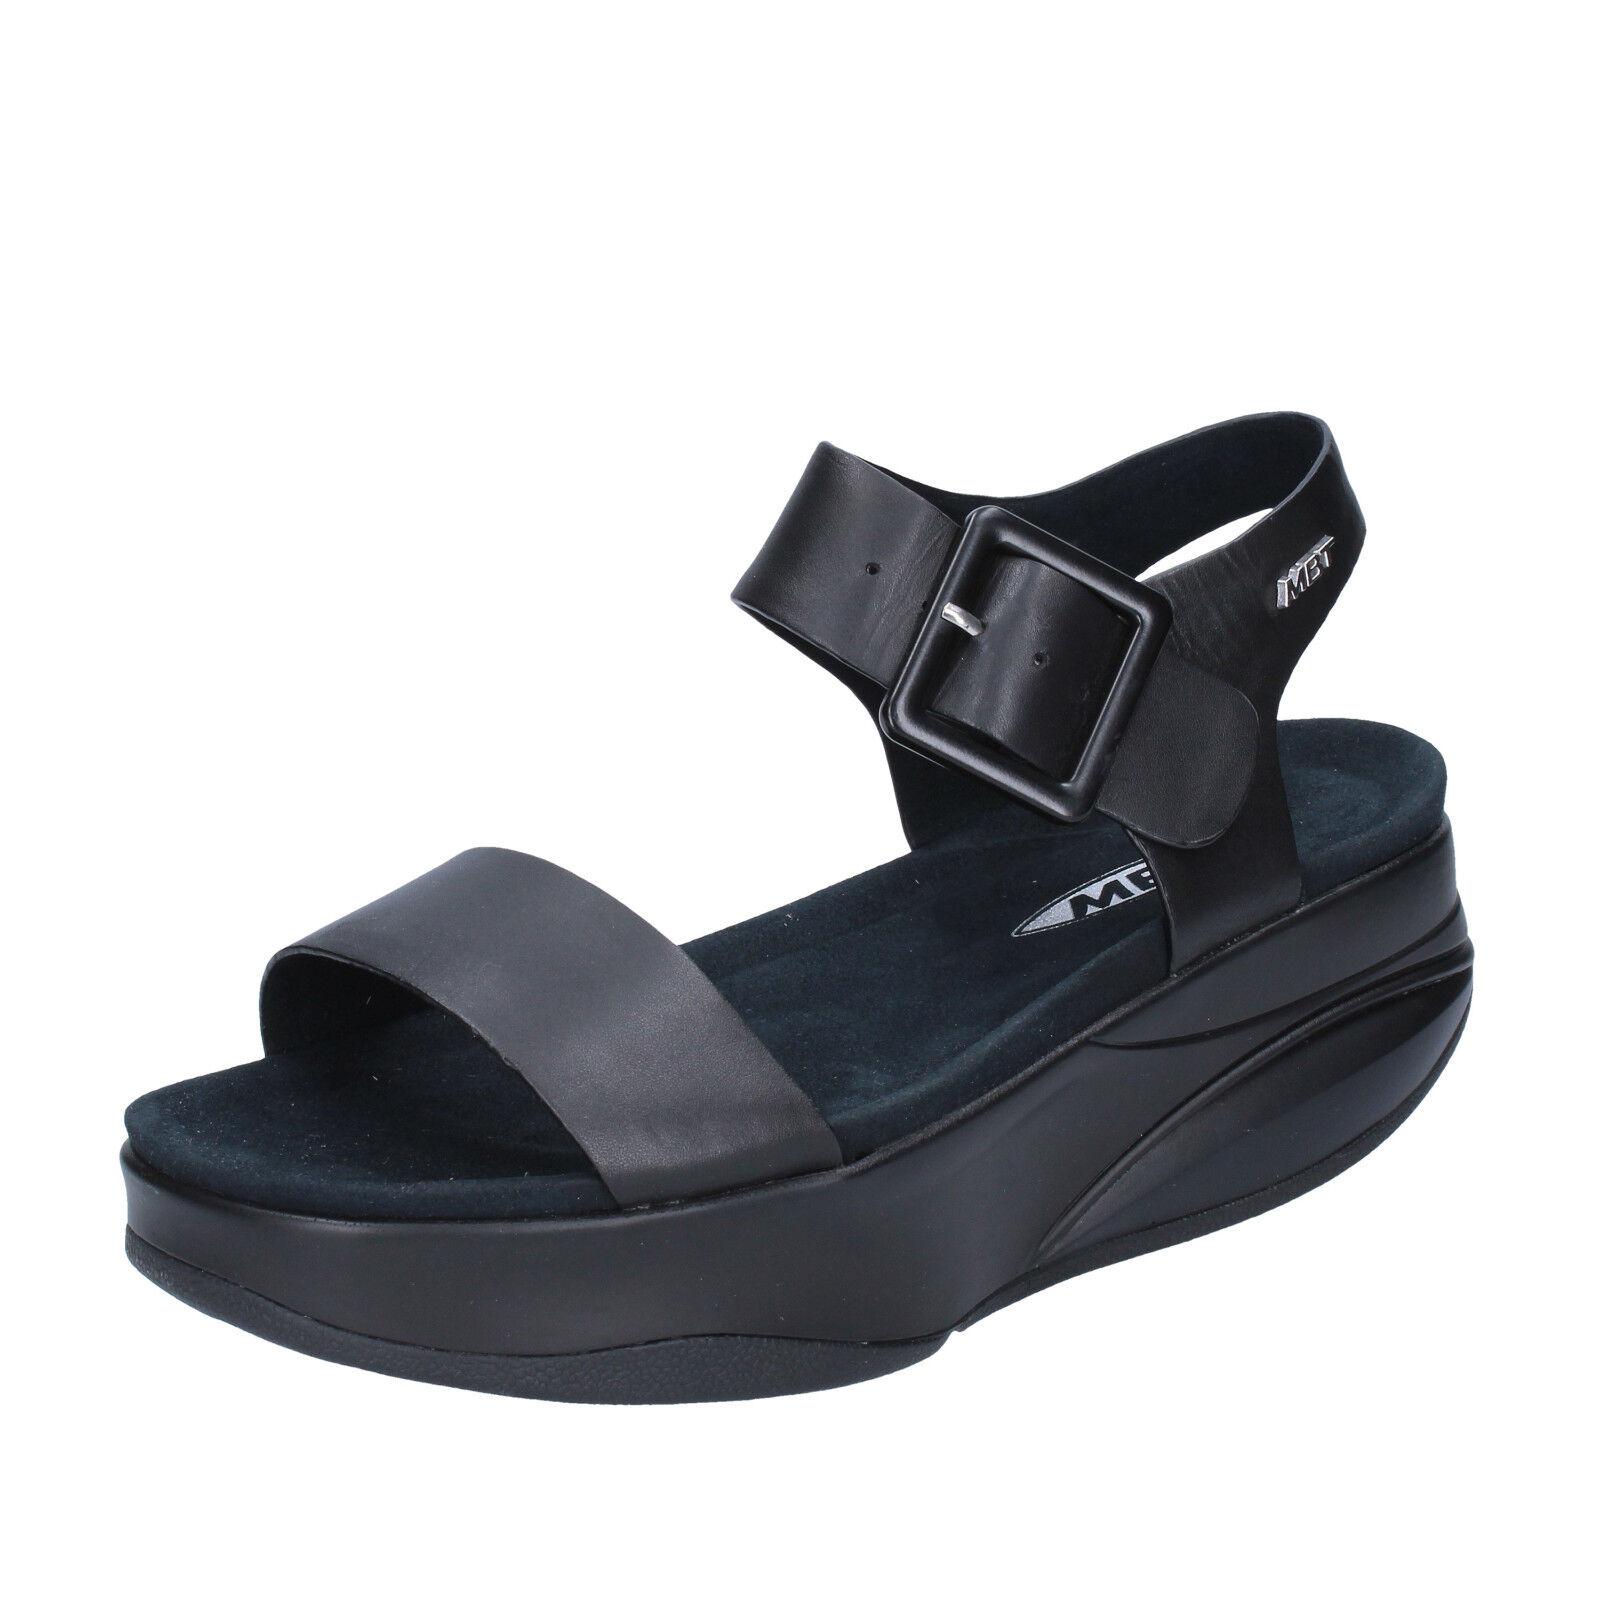 Descuento por tiempo limitado scarpe donna MBT MANNI 40 EU sandali nero pelle performance BX885-40